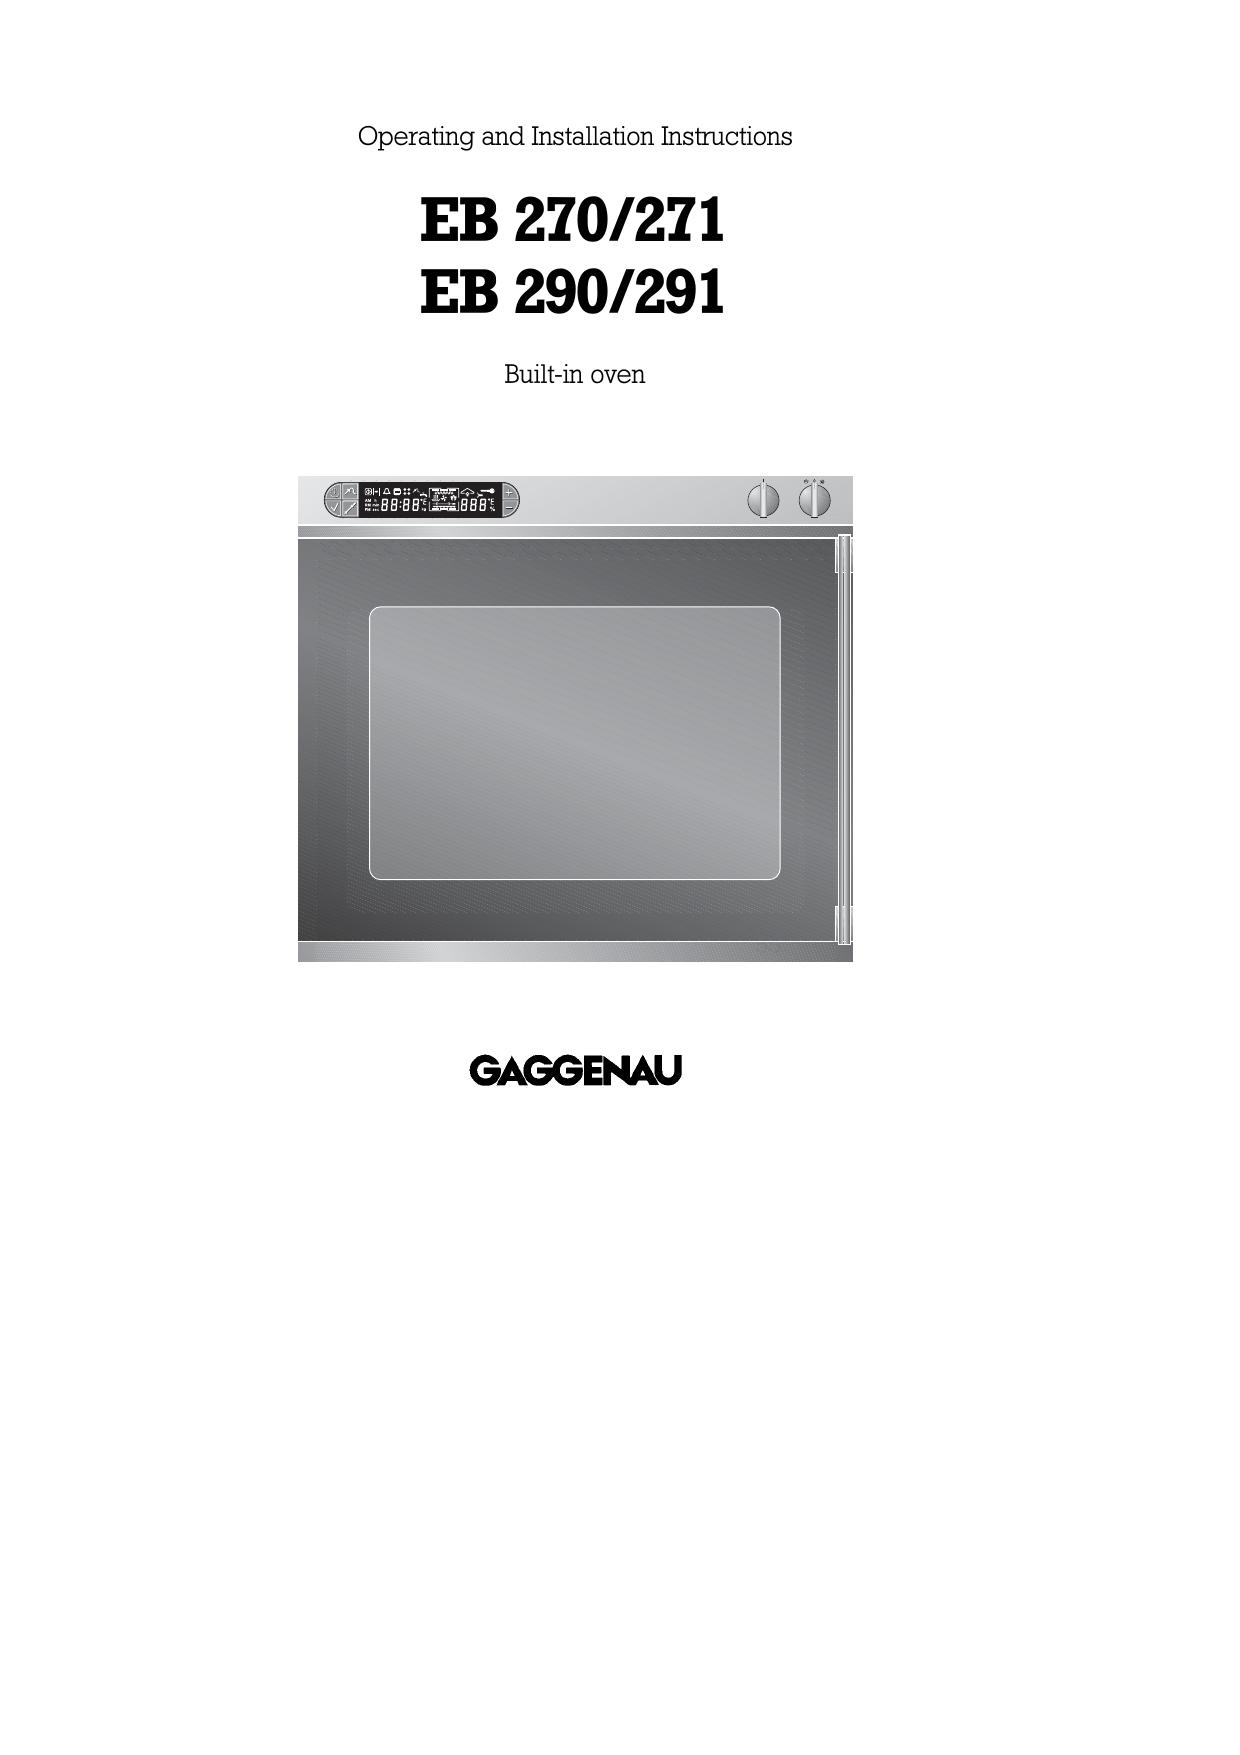 Gaggenau Microwave Oven Eb 270 271 User Manual Manualzz